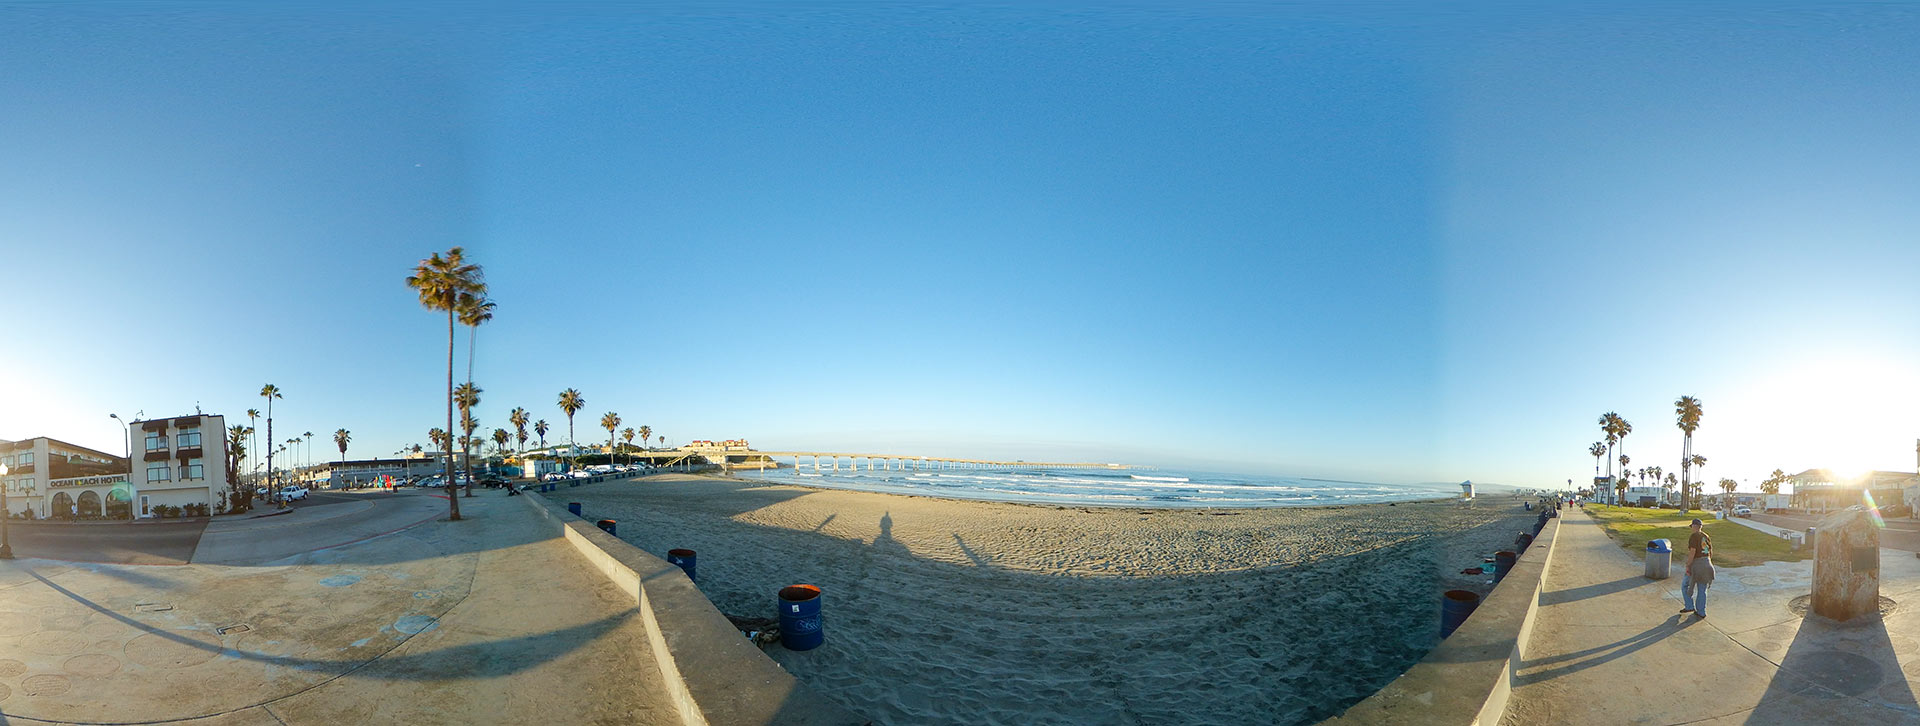 Ocean Beach, San Diego - Veteran's Plaza